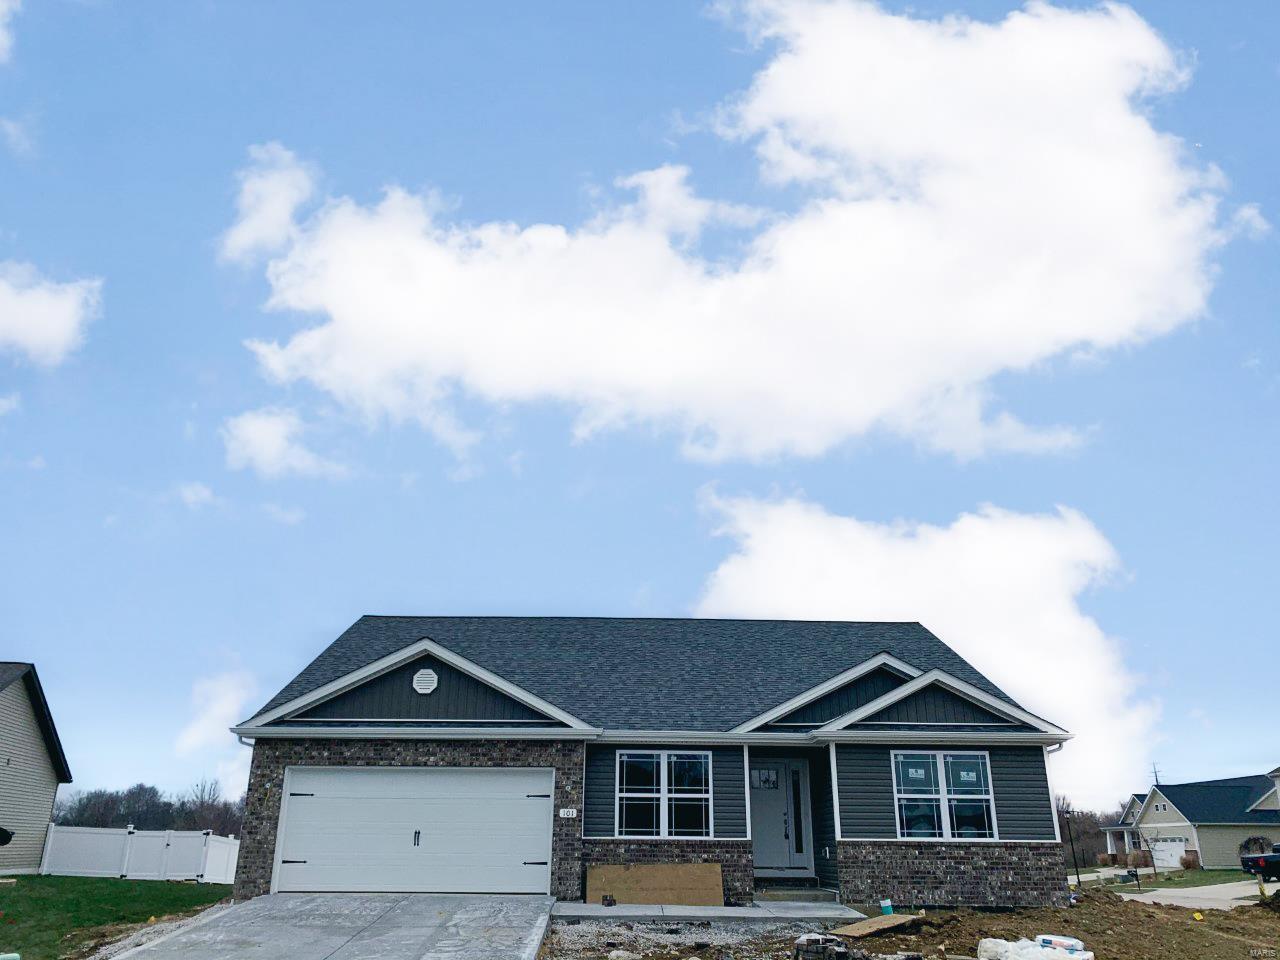 101 George Bush Blvd Property Photo - Troy, IL real estate listing